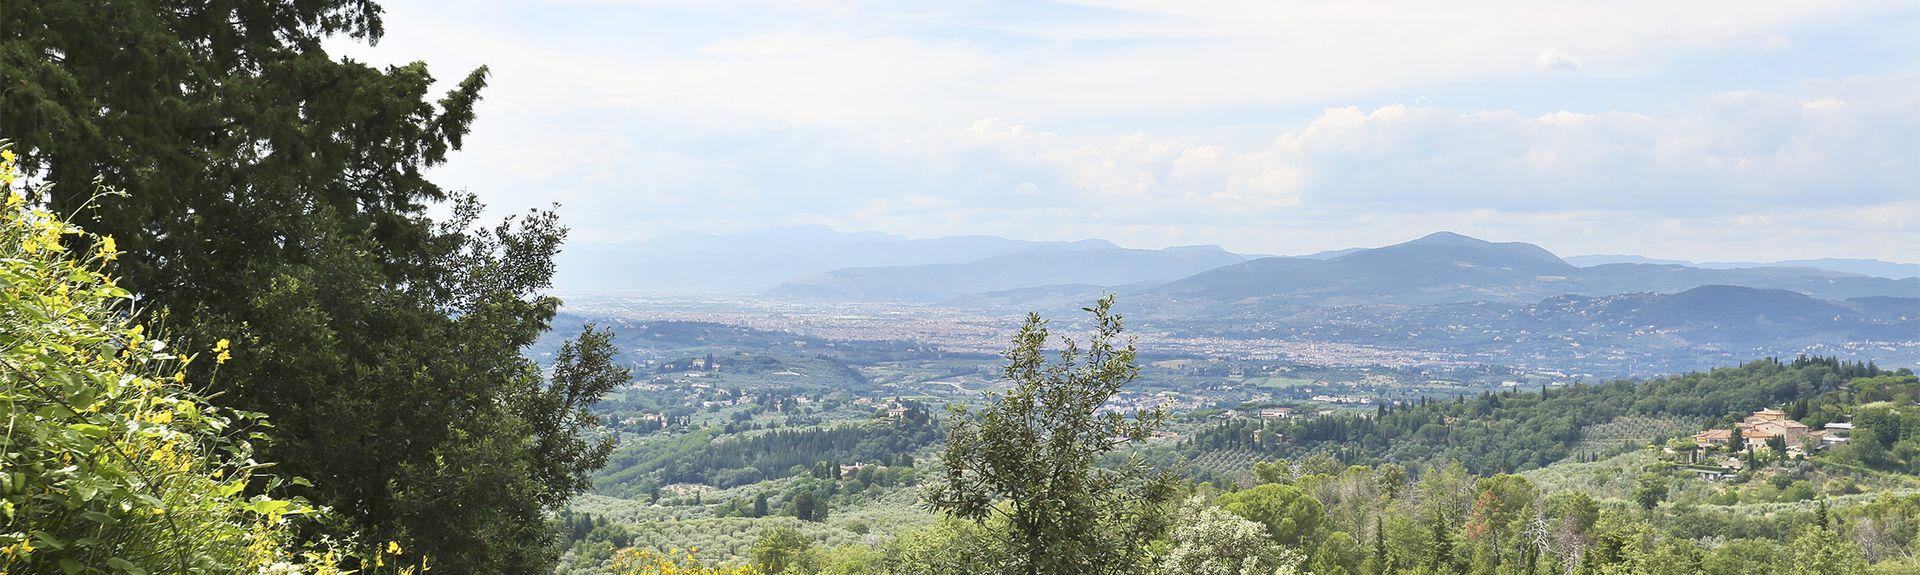 Fiesole, Toscana, Italia